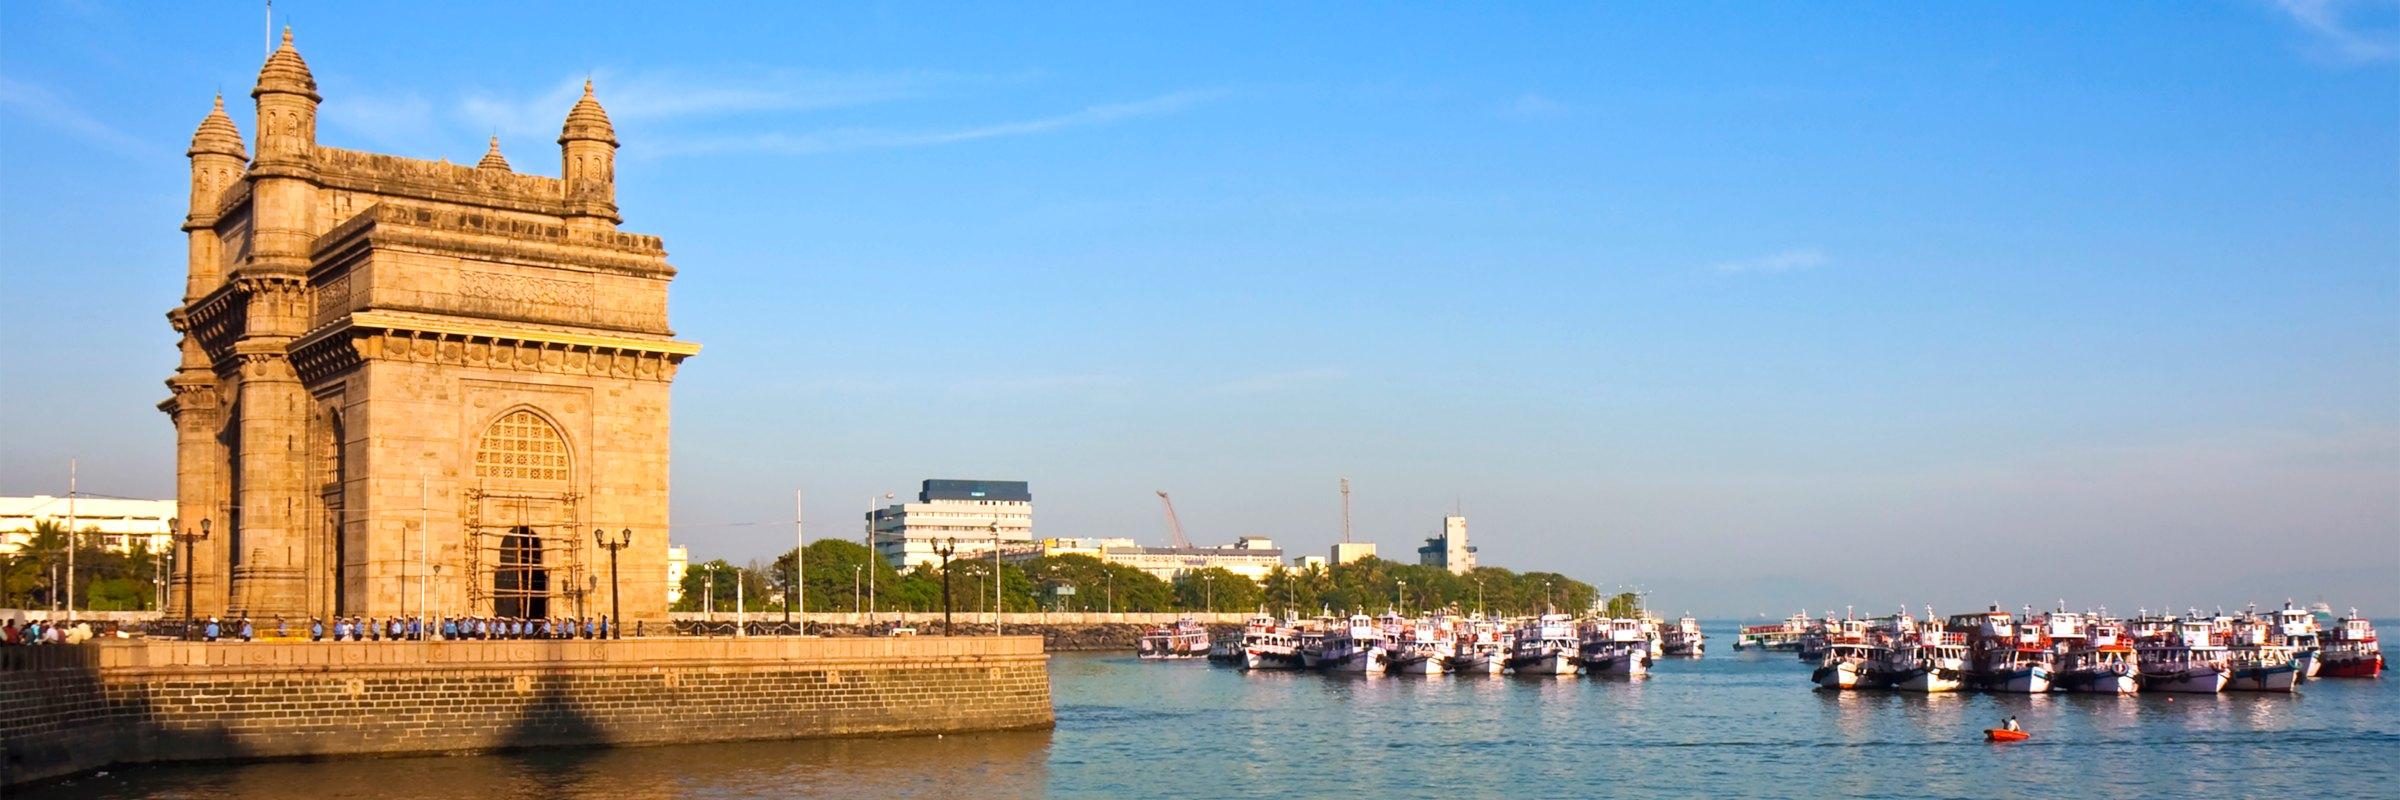 Gateway of India in Mumbai während des Sonnenuntergangs – Bombay Citytour